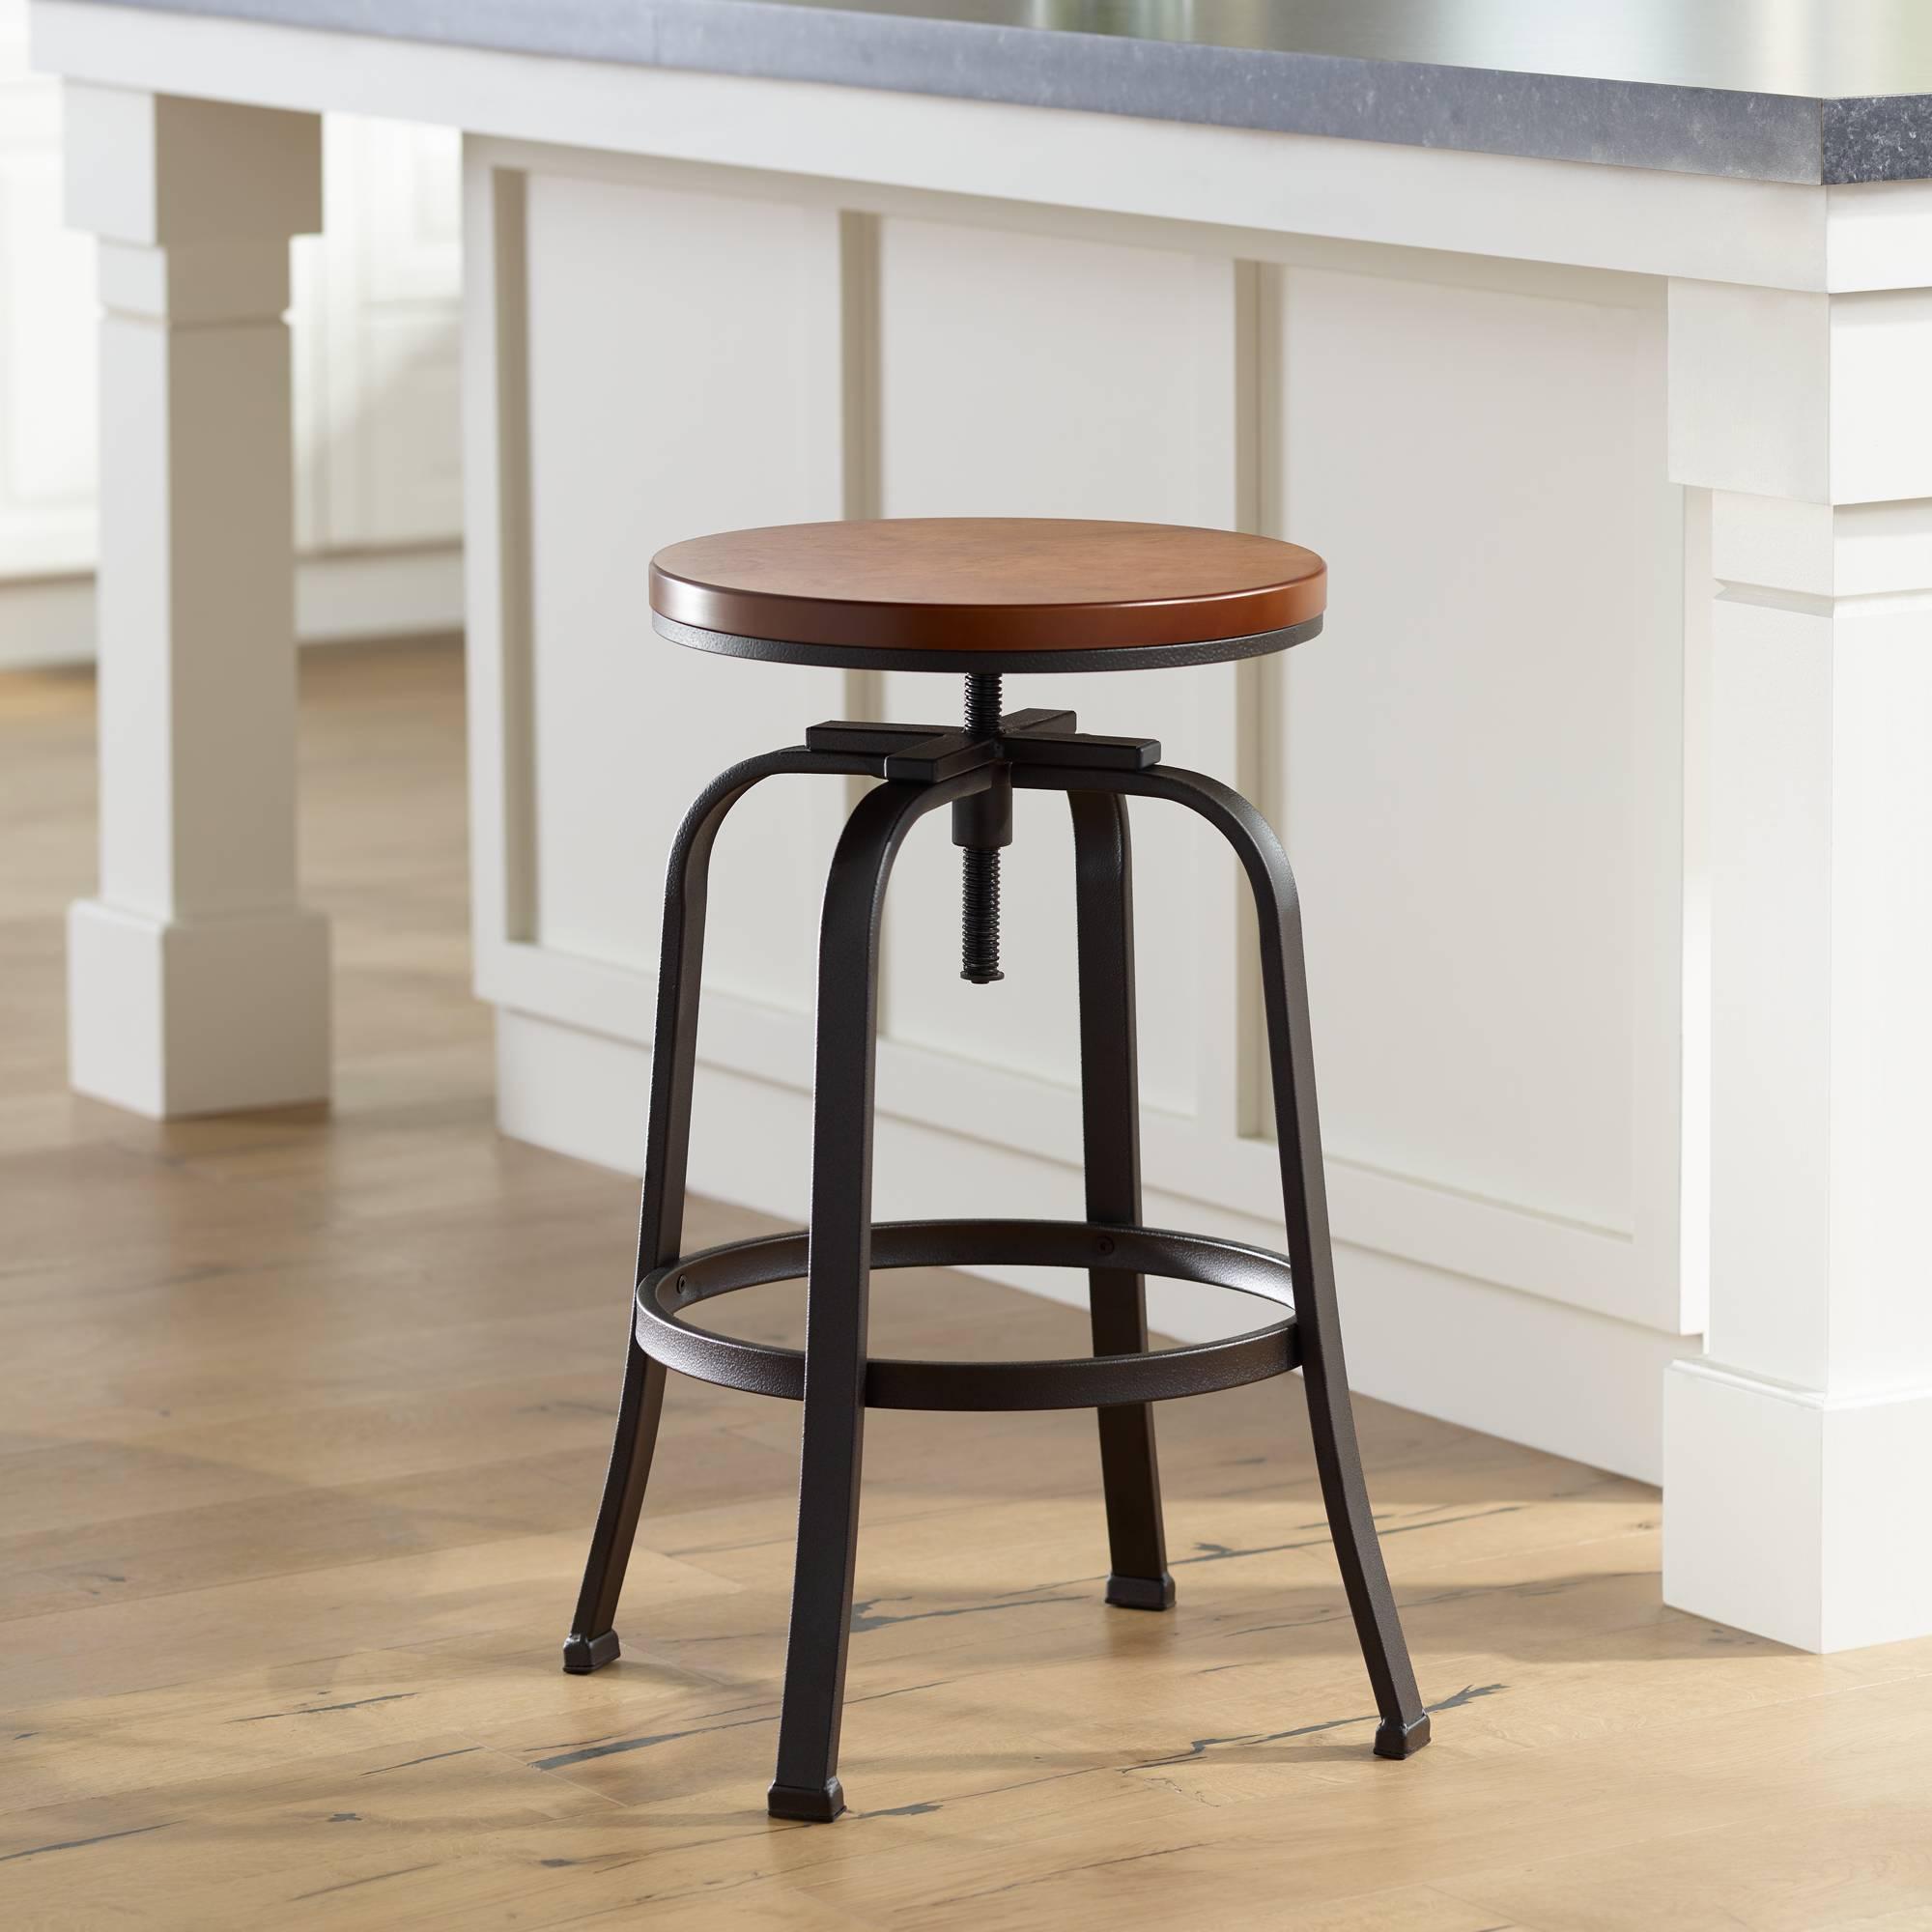 Prime Details About Radin Hammered Bronze Adjustable Height Swivel Bar Stool Cjindustries Chair Design For Home Cjindustriesco